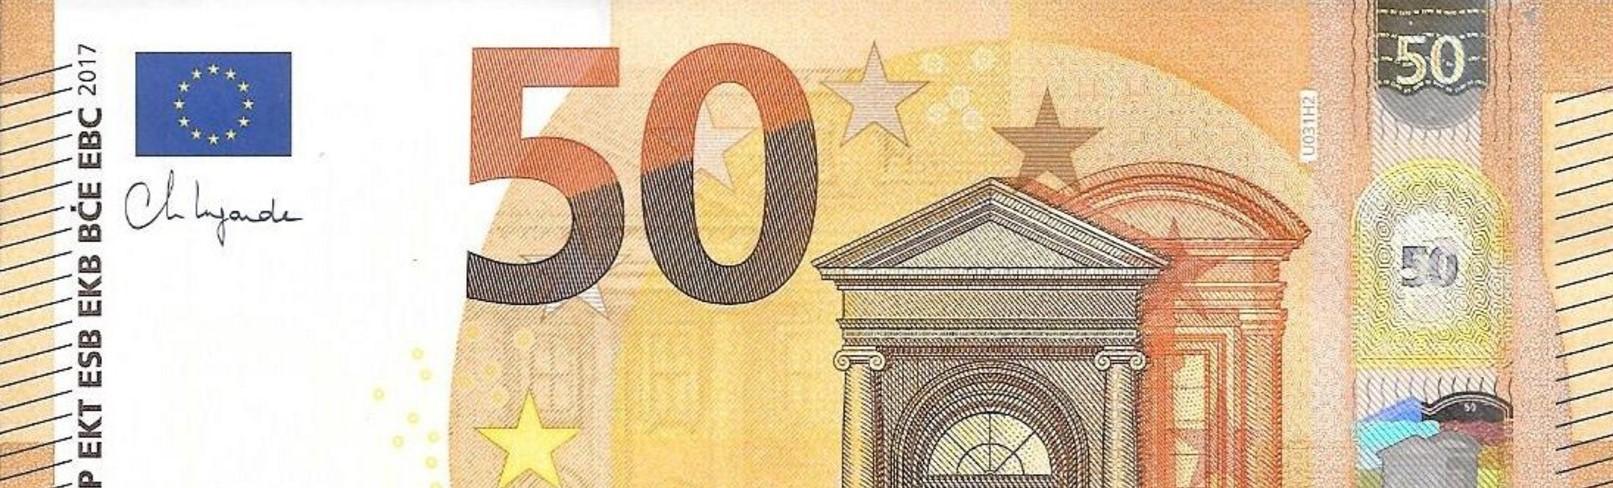 50_u_u_031_lagarde_-_collection_europe_.jpg